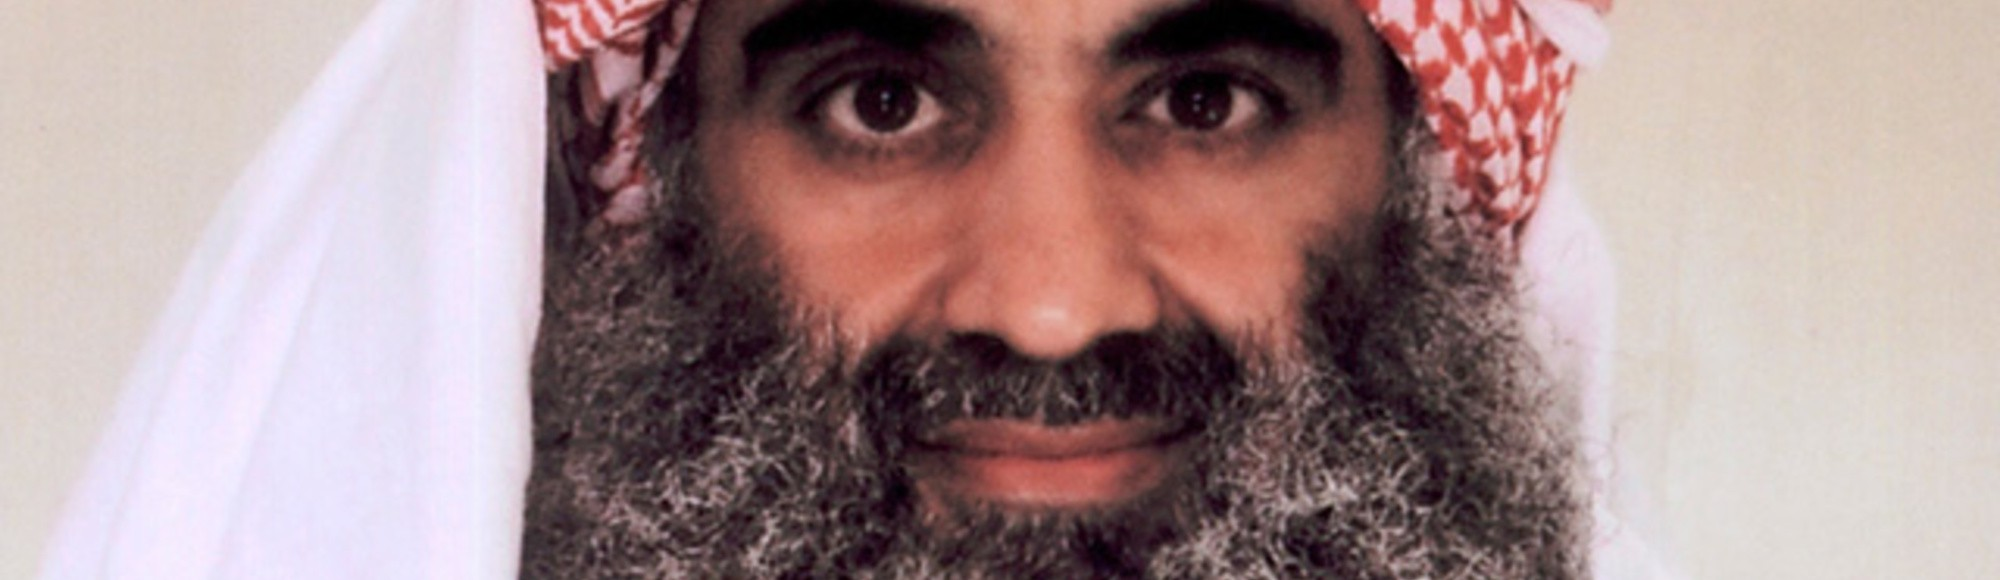 Khalid Sheikh Lawyer Happening at Khalid Sheikh